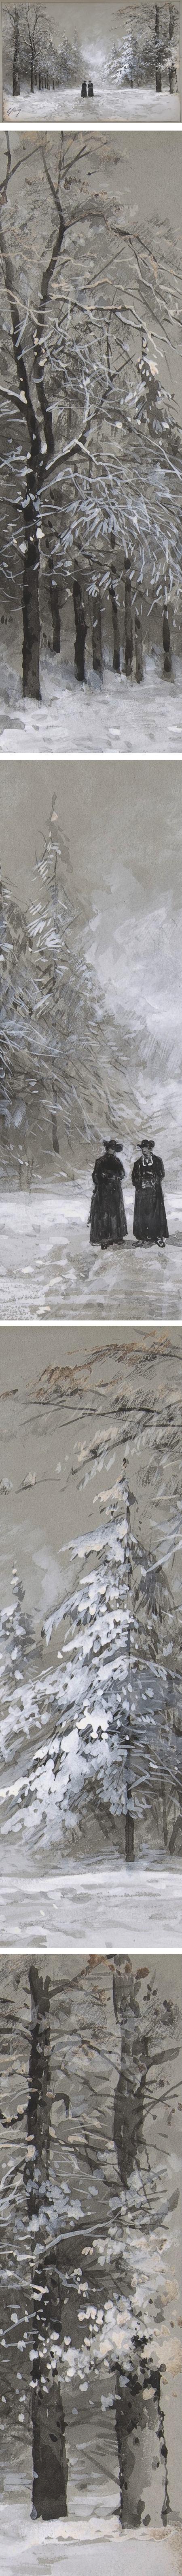 Winter Scene with Two Men, Eugene Ciceri